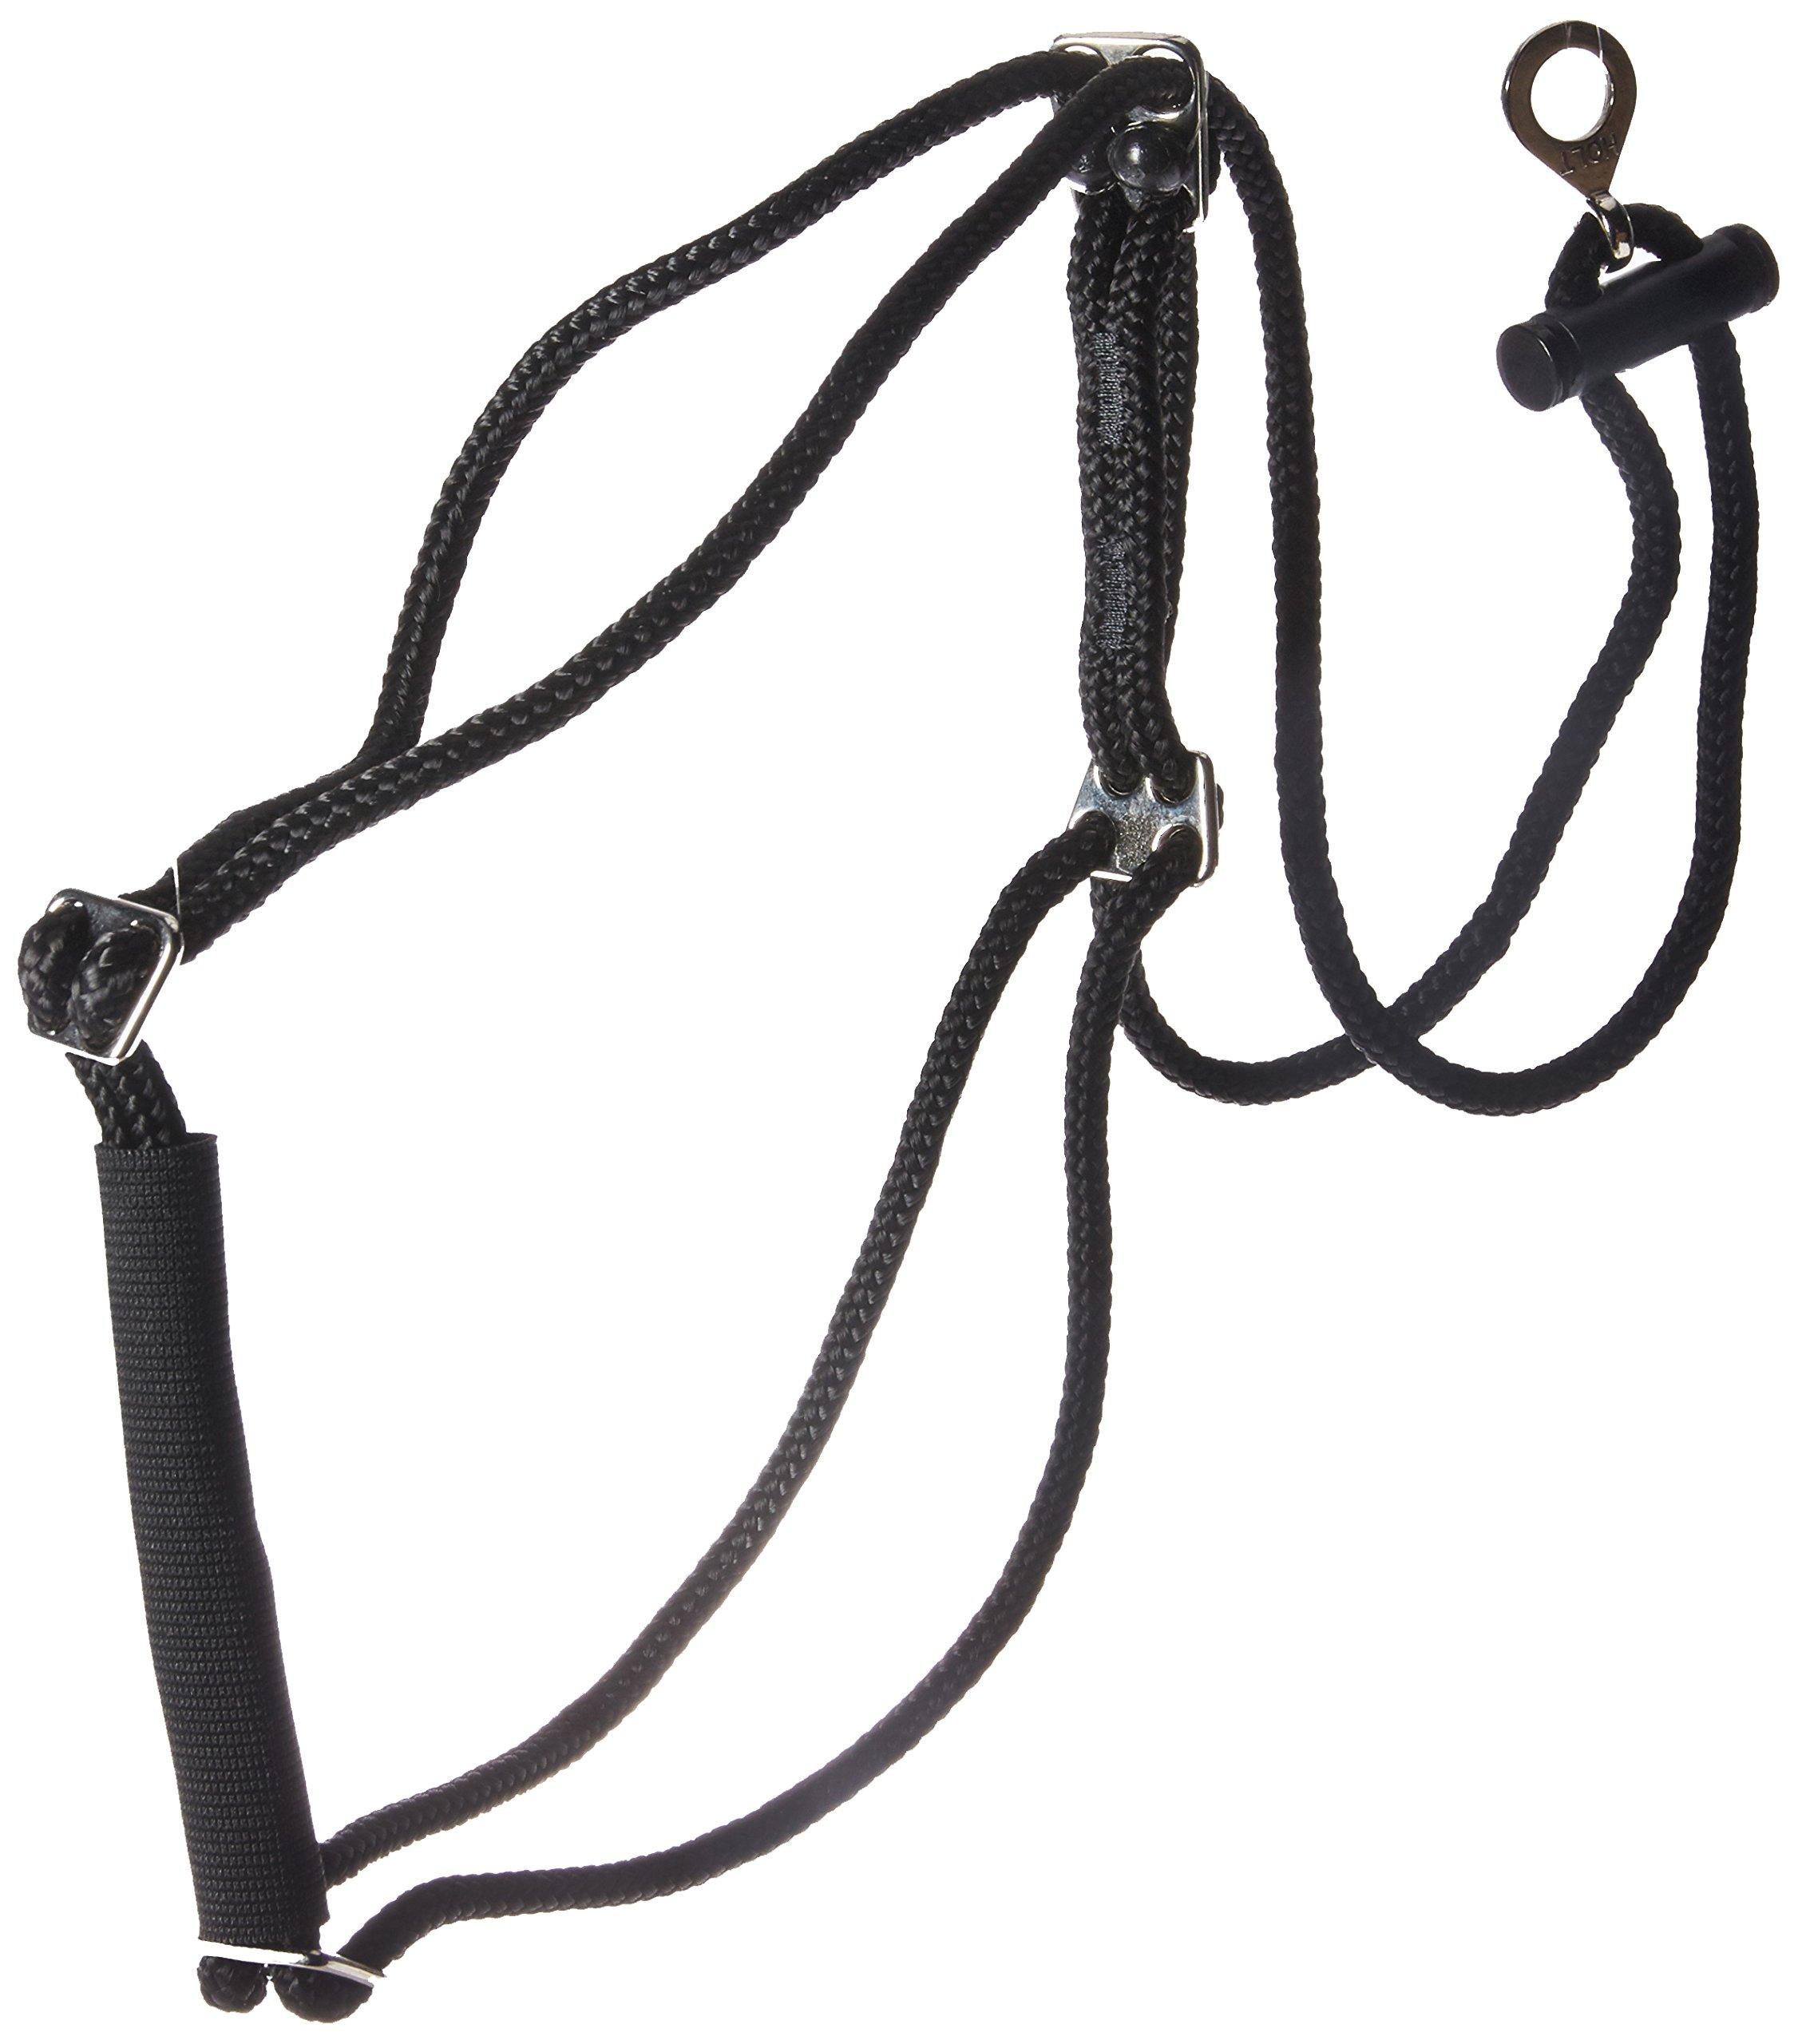 Coastal Pet Products DCP603320MD Nylon Walk Right Control Dog Harness, Medium, Black